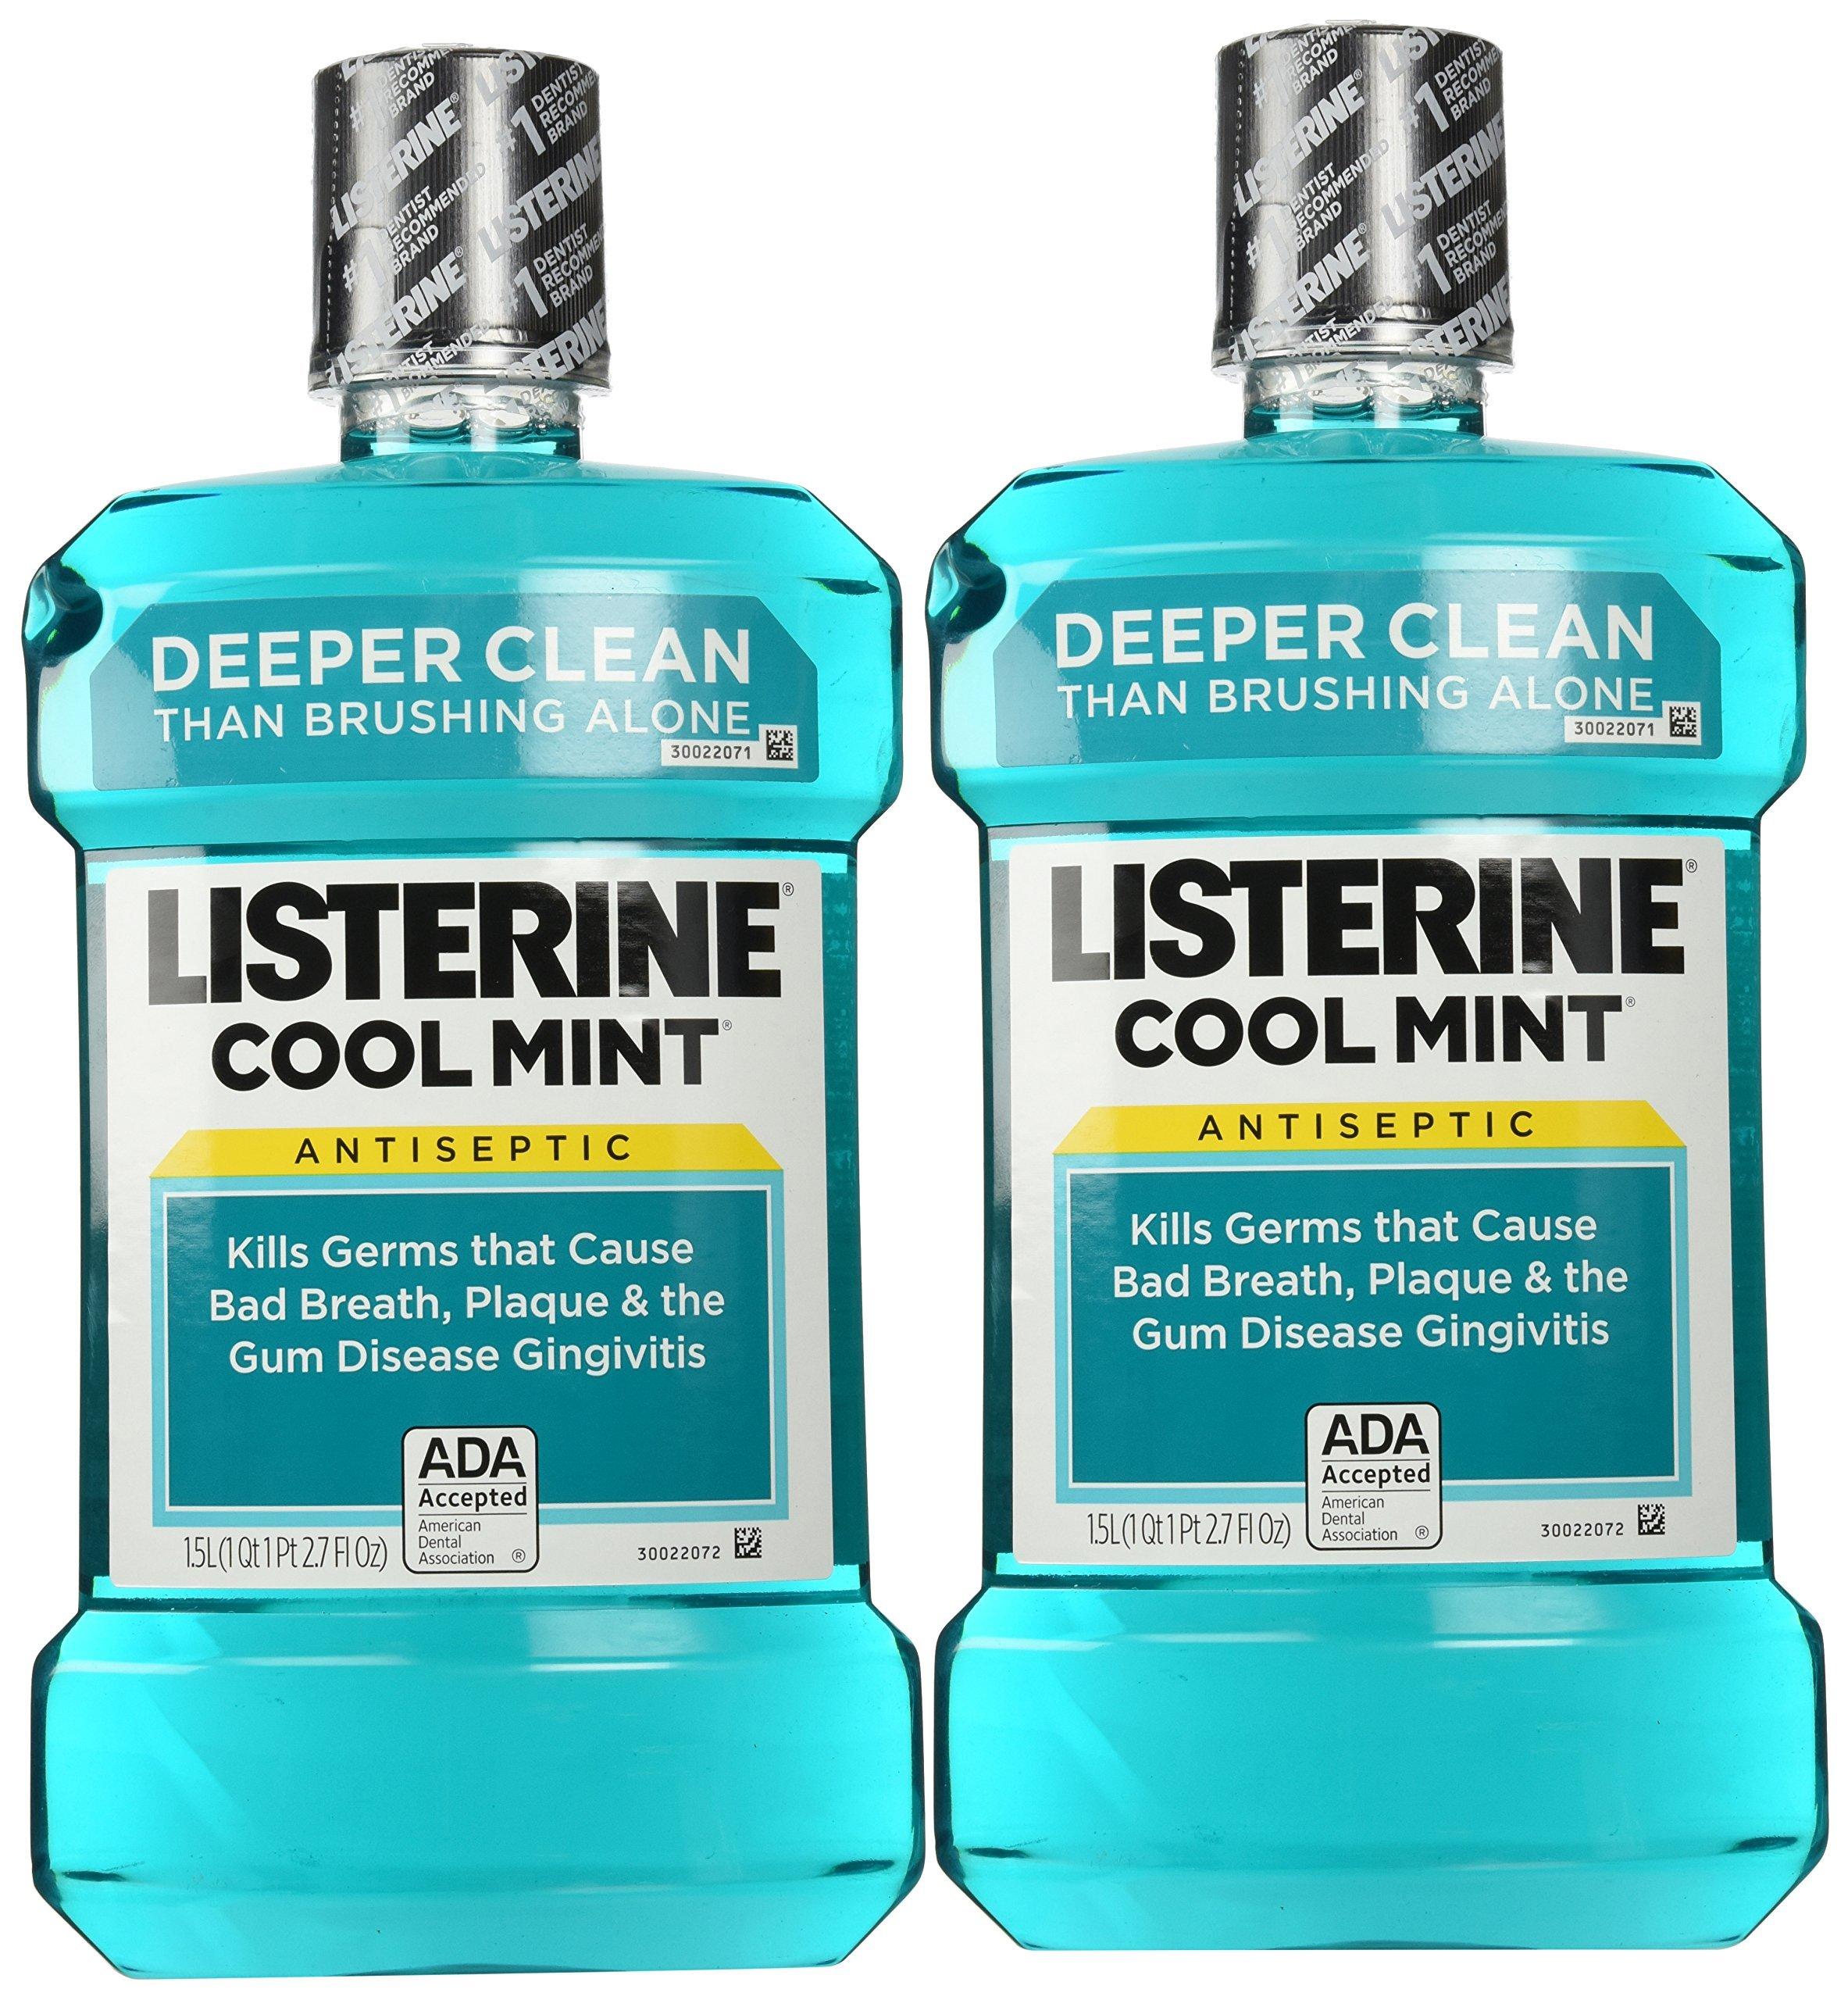 Listerine Mint (1.5l) Size 50.7z Listerine Cool Mint Antiseptic Mouthwash (Pack of 2)